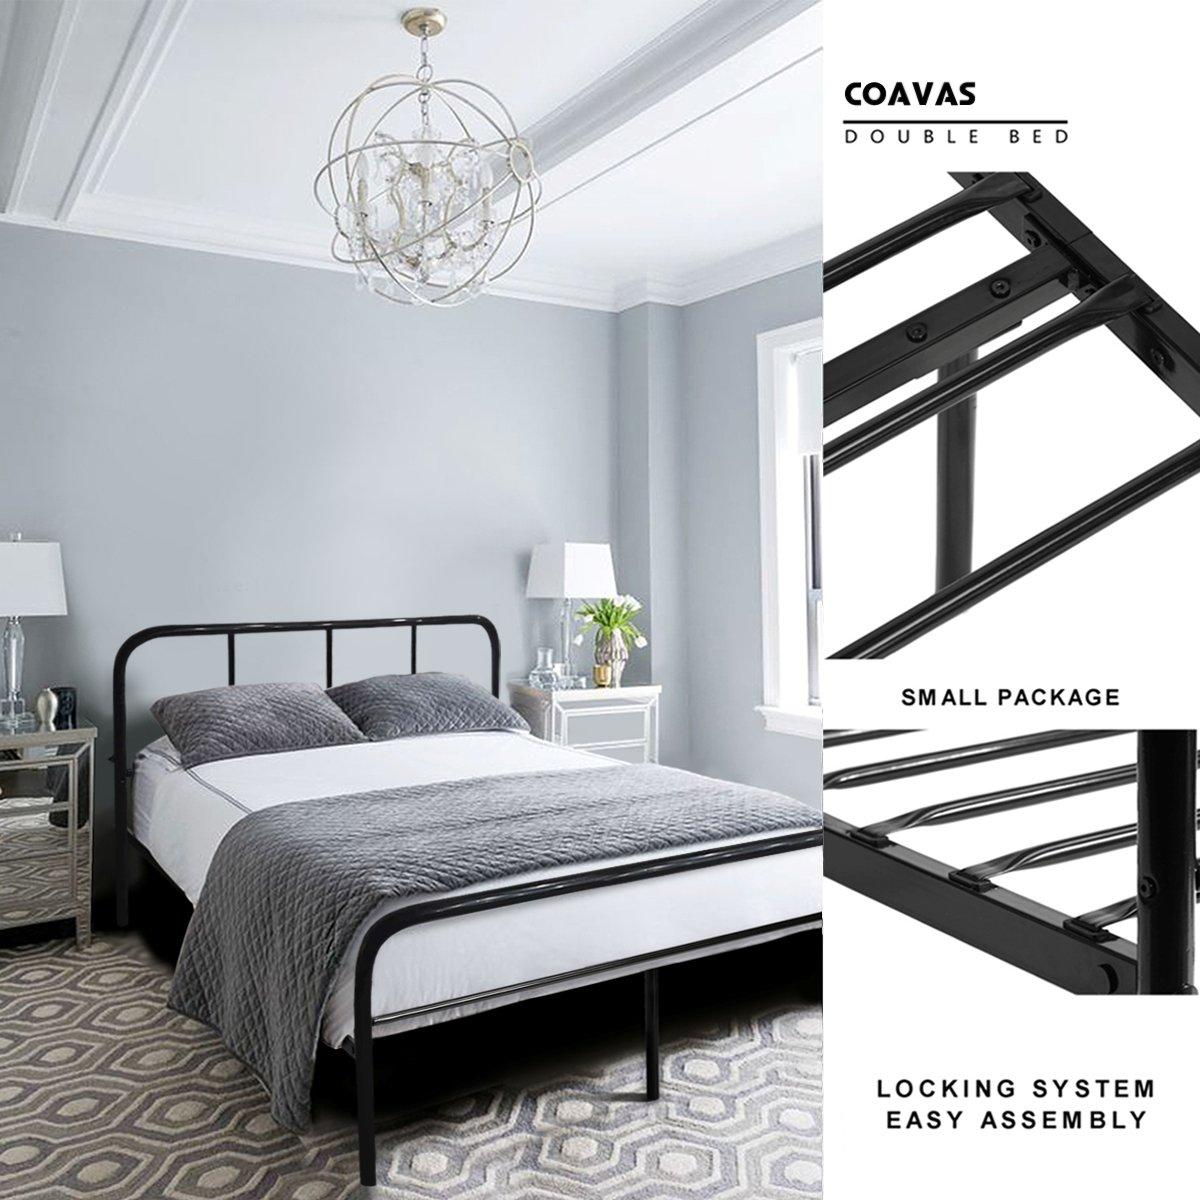 Marco de cama de metal Coavas 4 pies 6 doble Queen Size base de ...